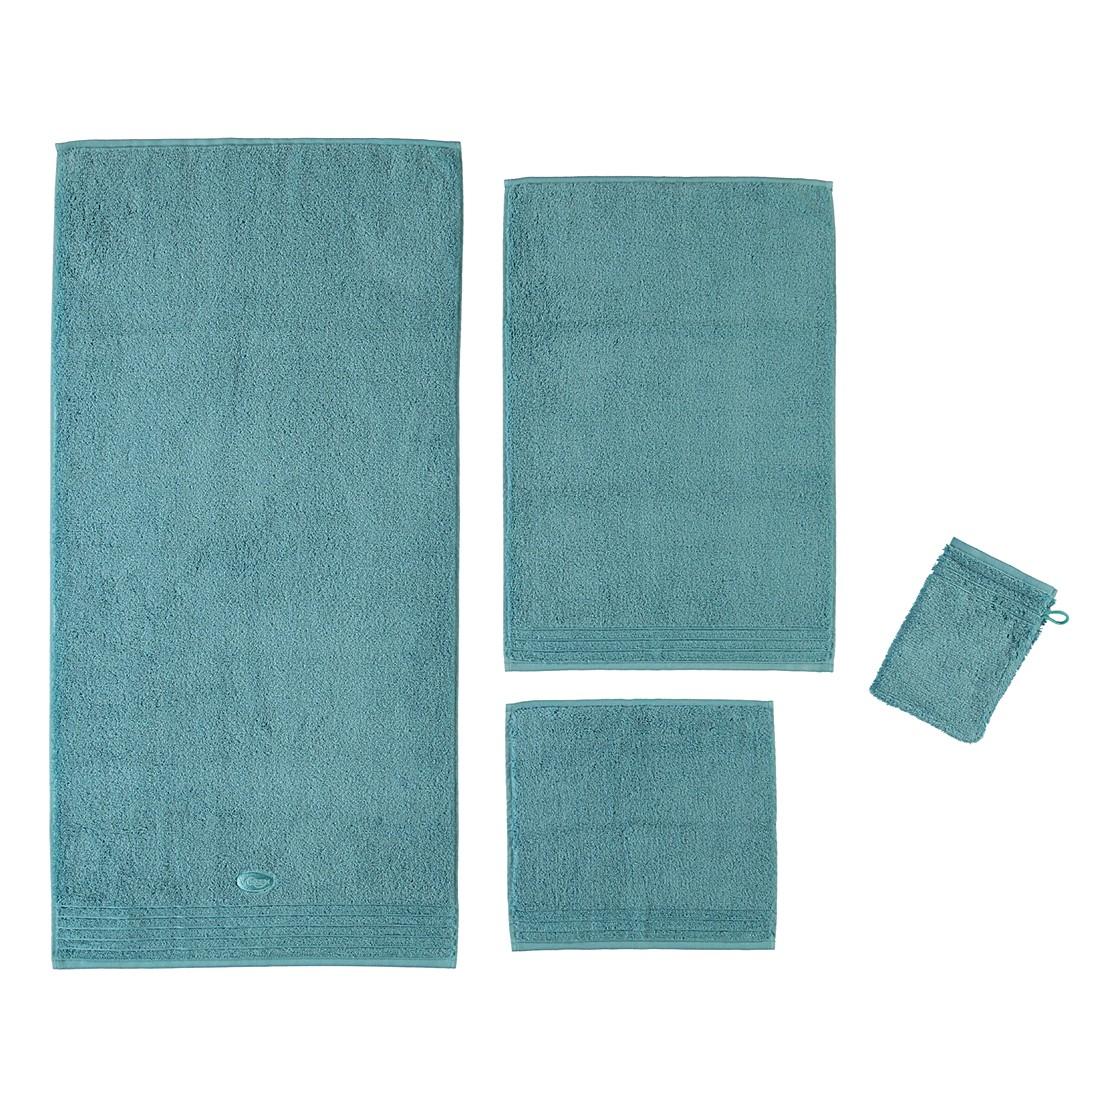 Handtücher Dreams – Baumwolle – Larimar – Waschhandschuh 16×22 cm, Vossen bestellen